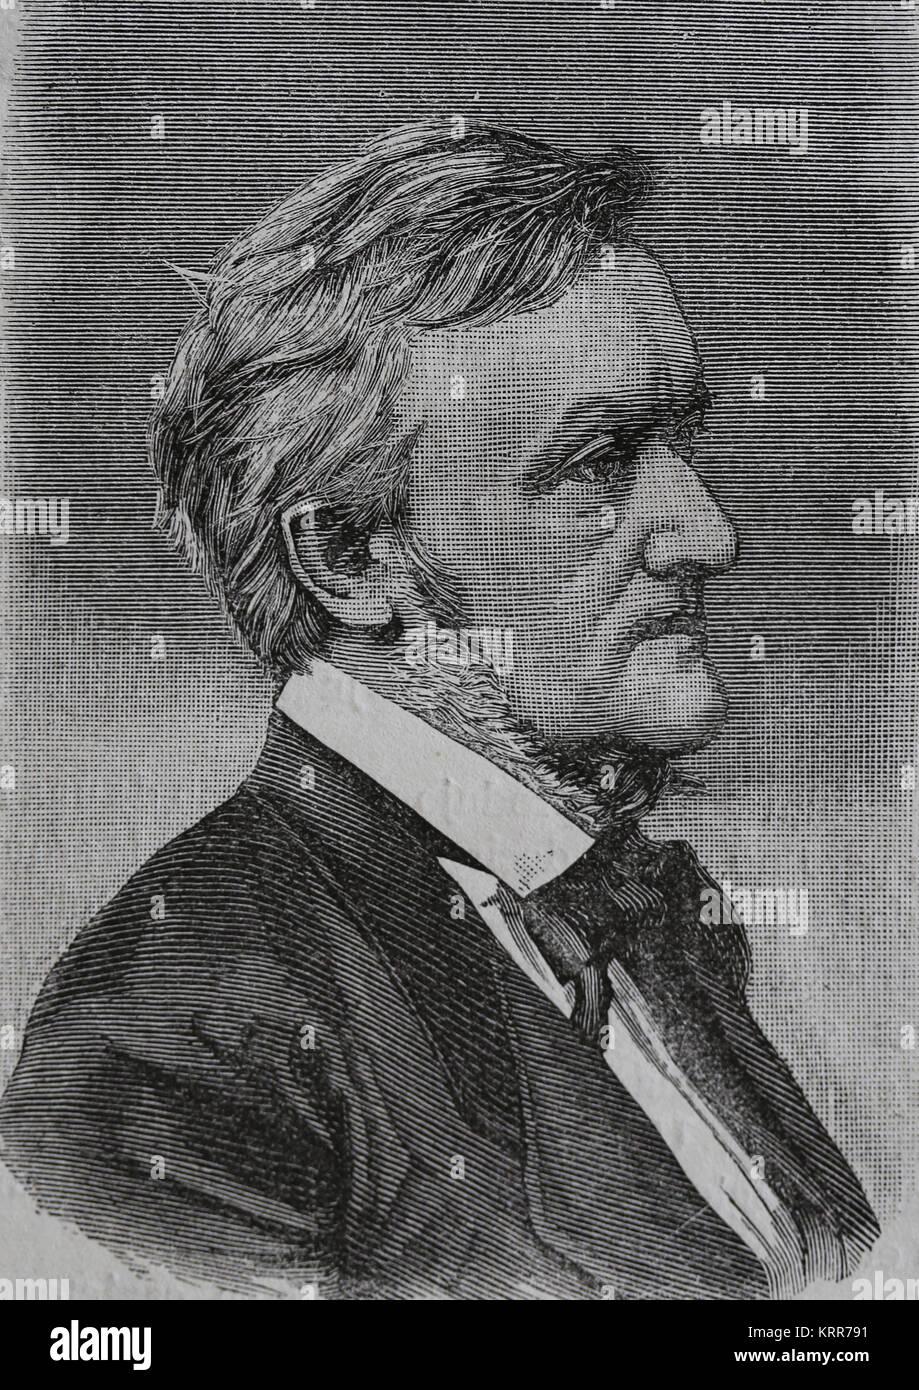 Richard Wagner (1813-1883). German composer. Portrait. Engraving, 1883. - Stock Image